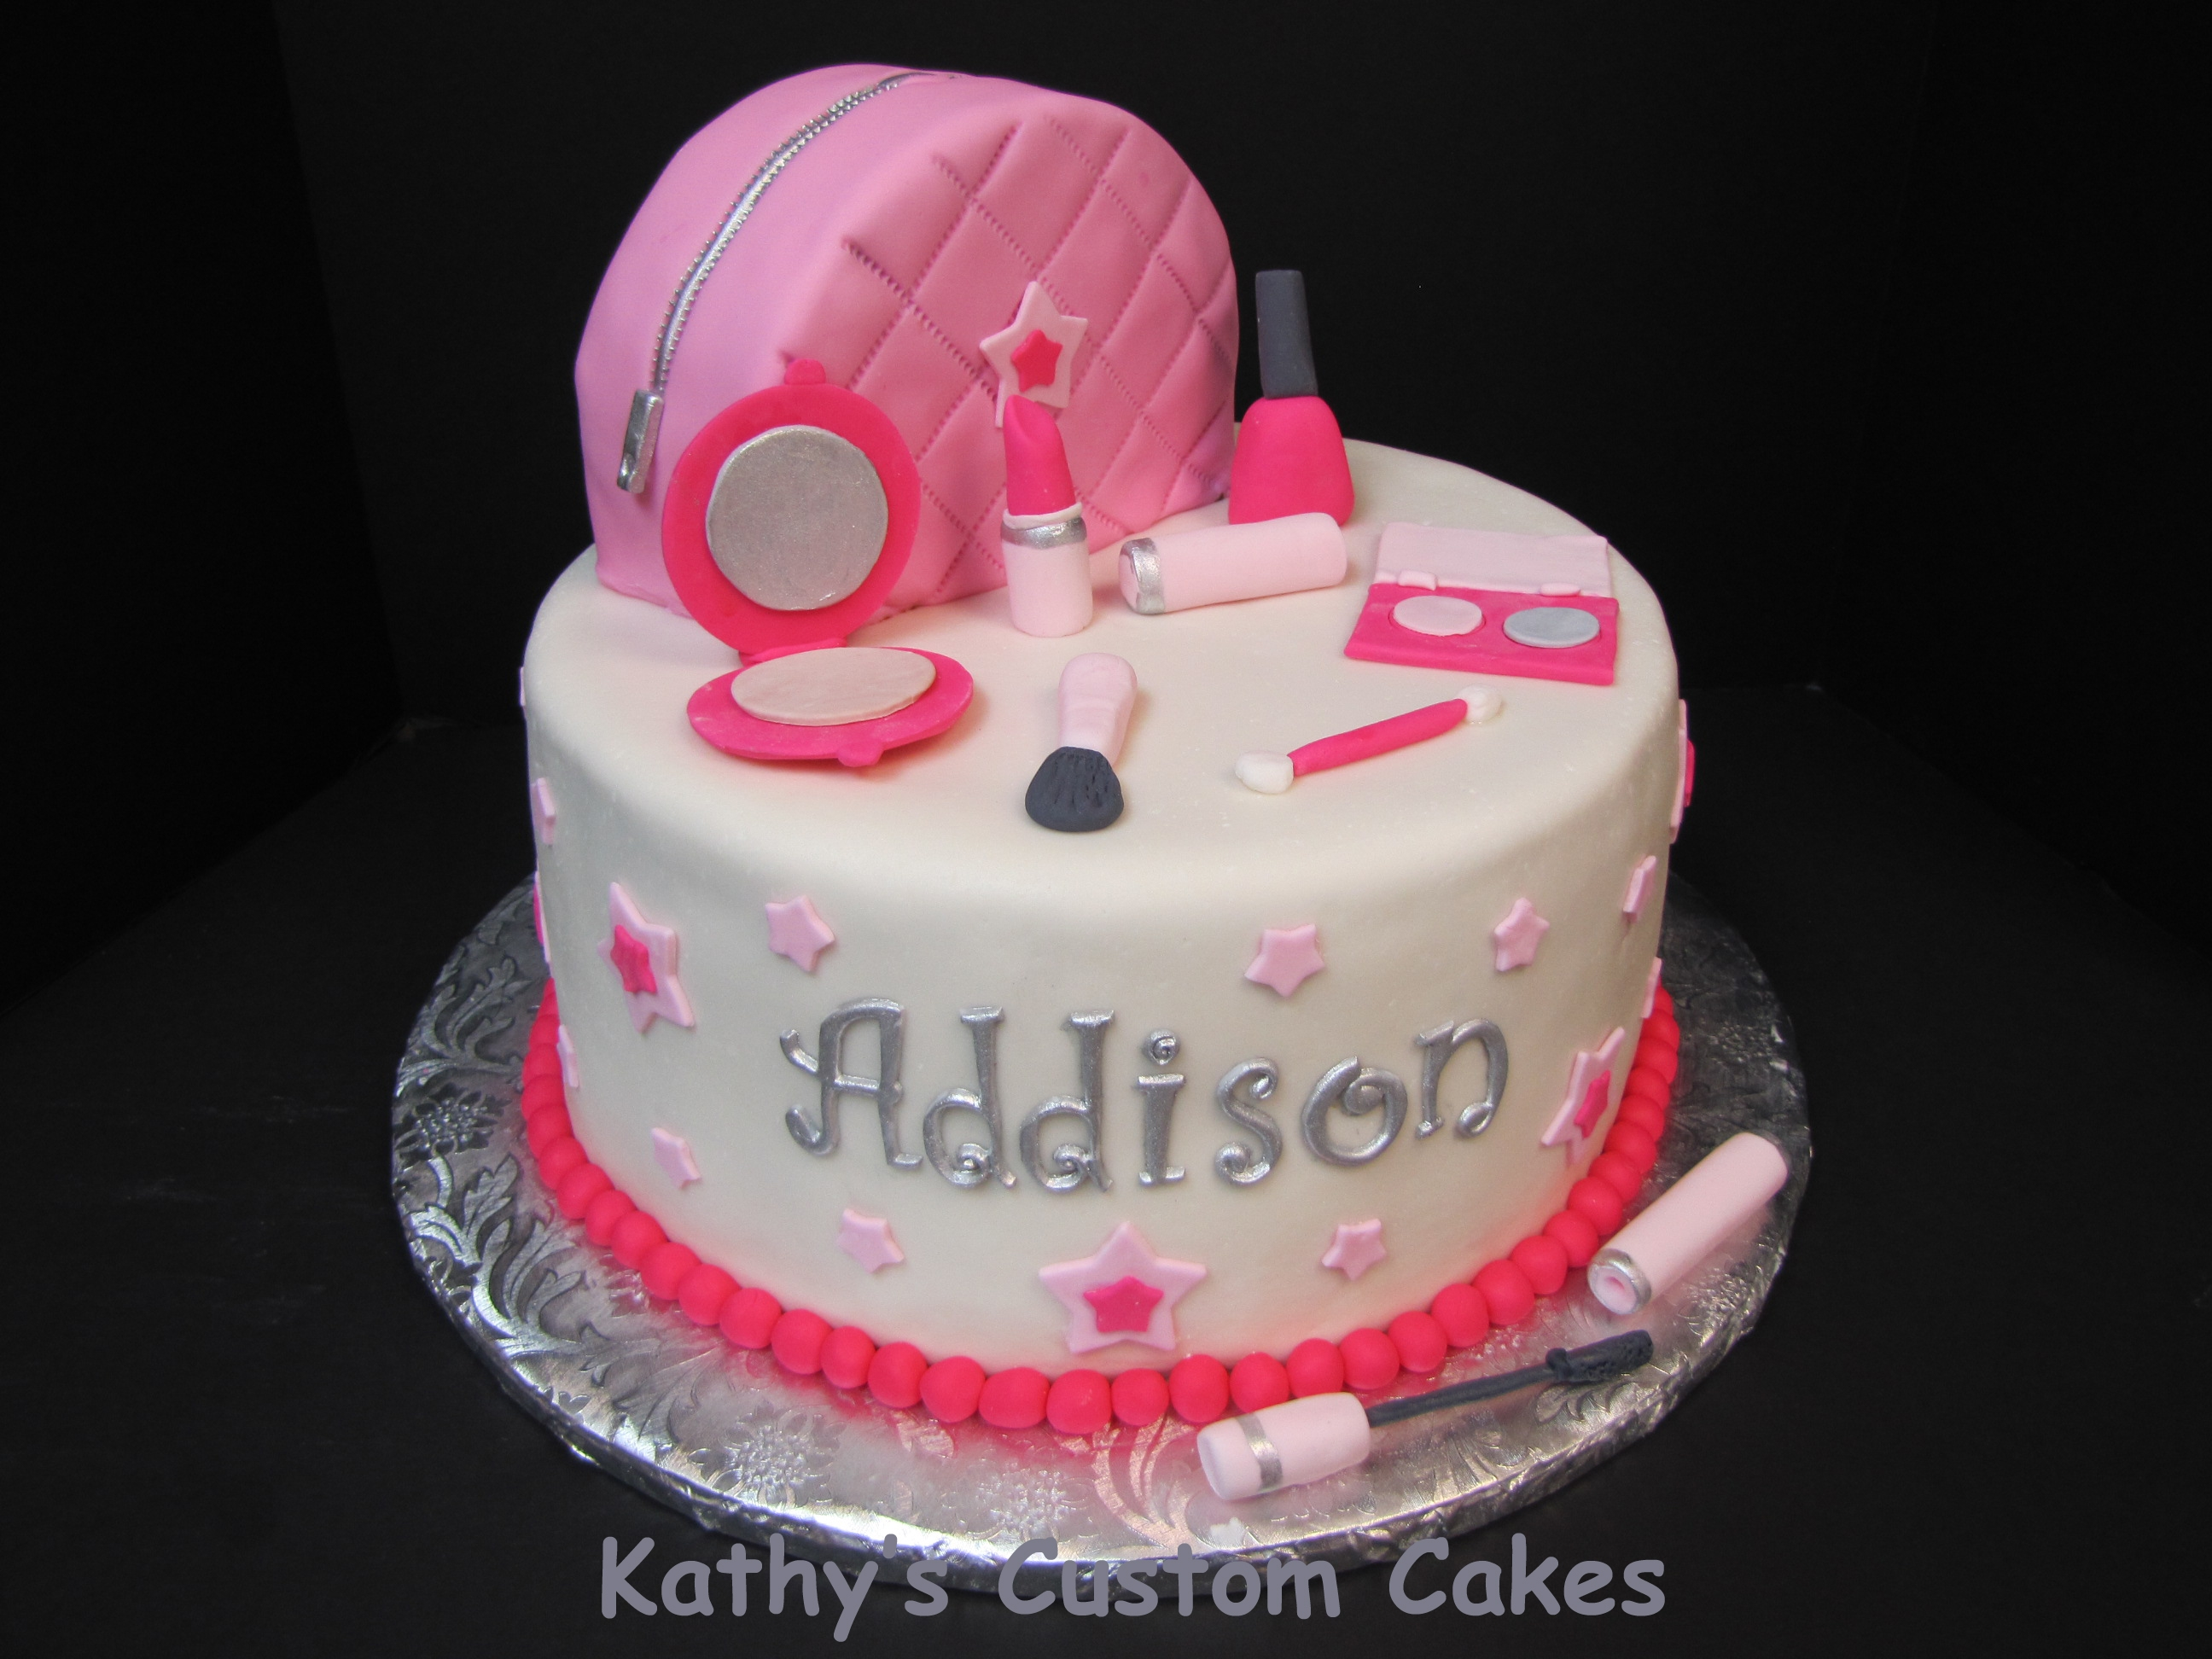 Make Up Cake For A Little Girl All Fondant And Gumpaste